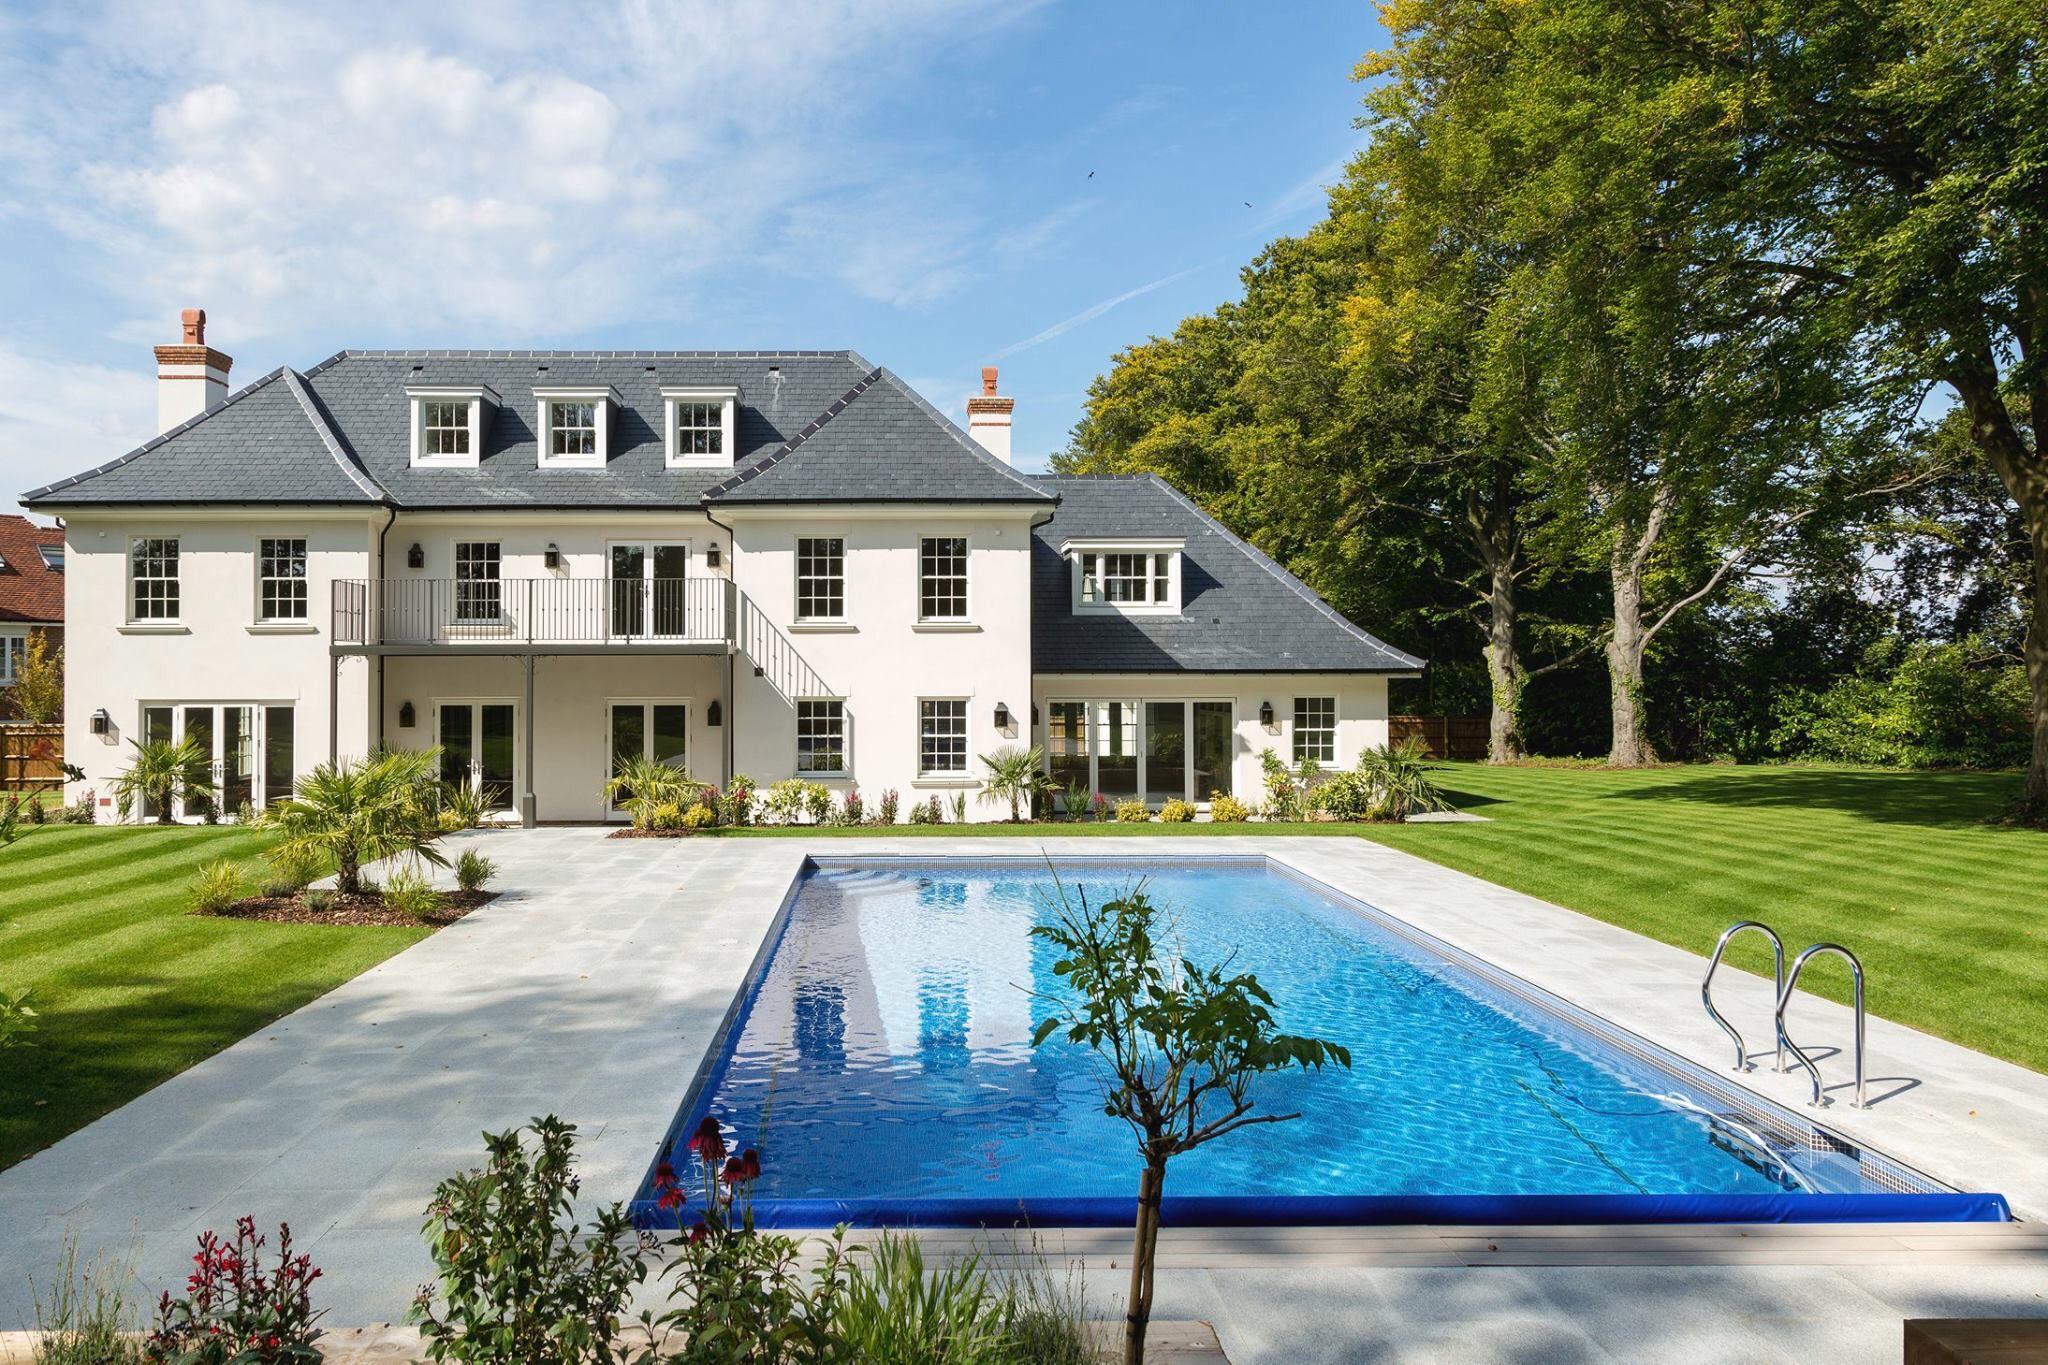 Ashtead Surrey House Designs Exterior Architectural Inspiration Georgian Style Homes